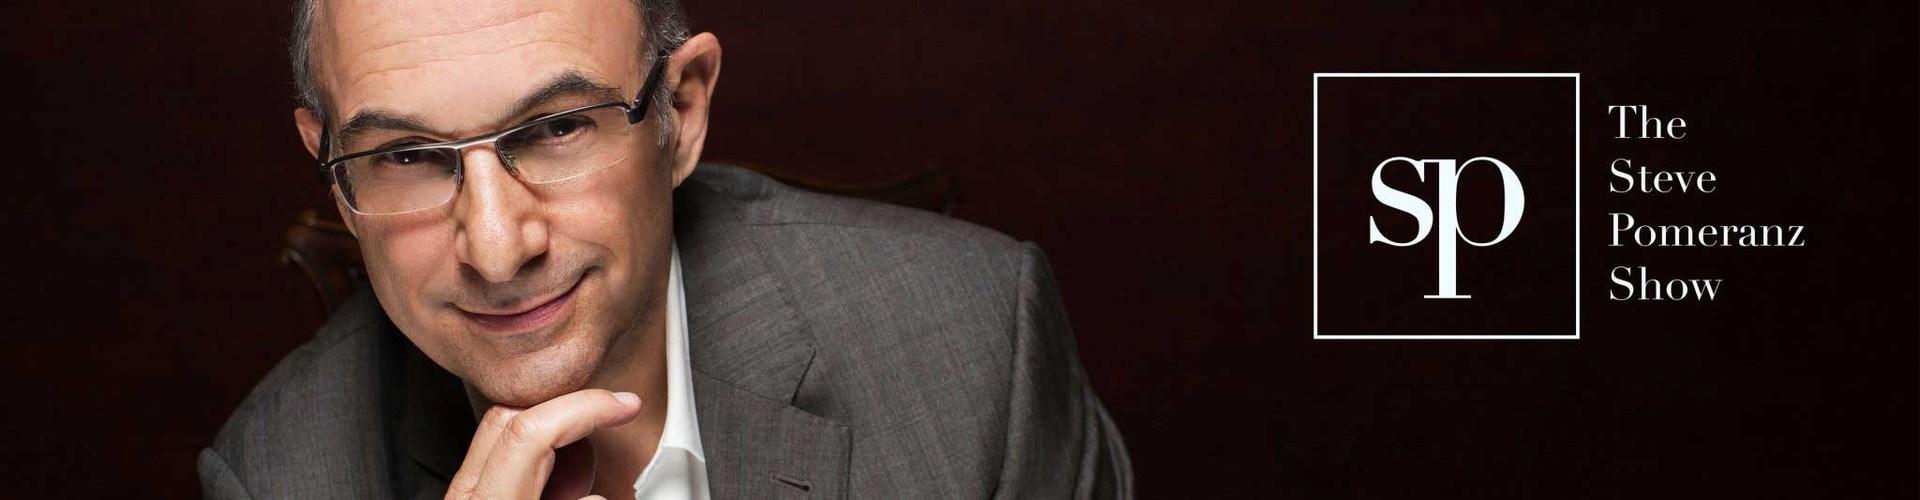 Steve Pomeranz Show